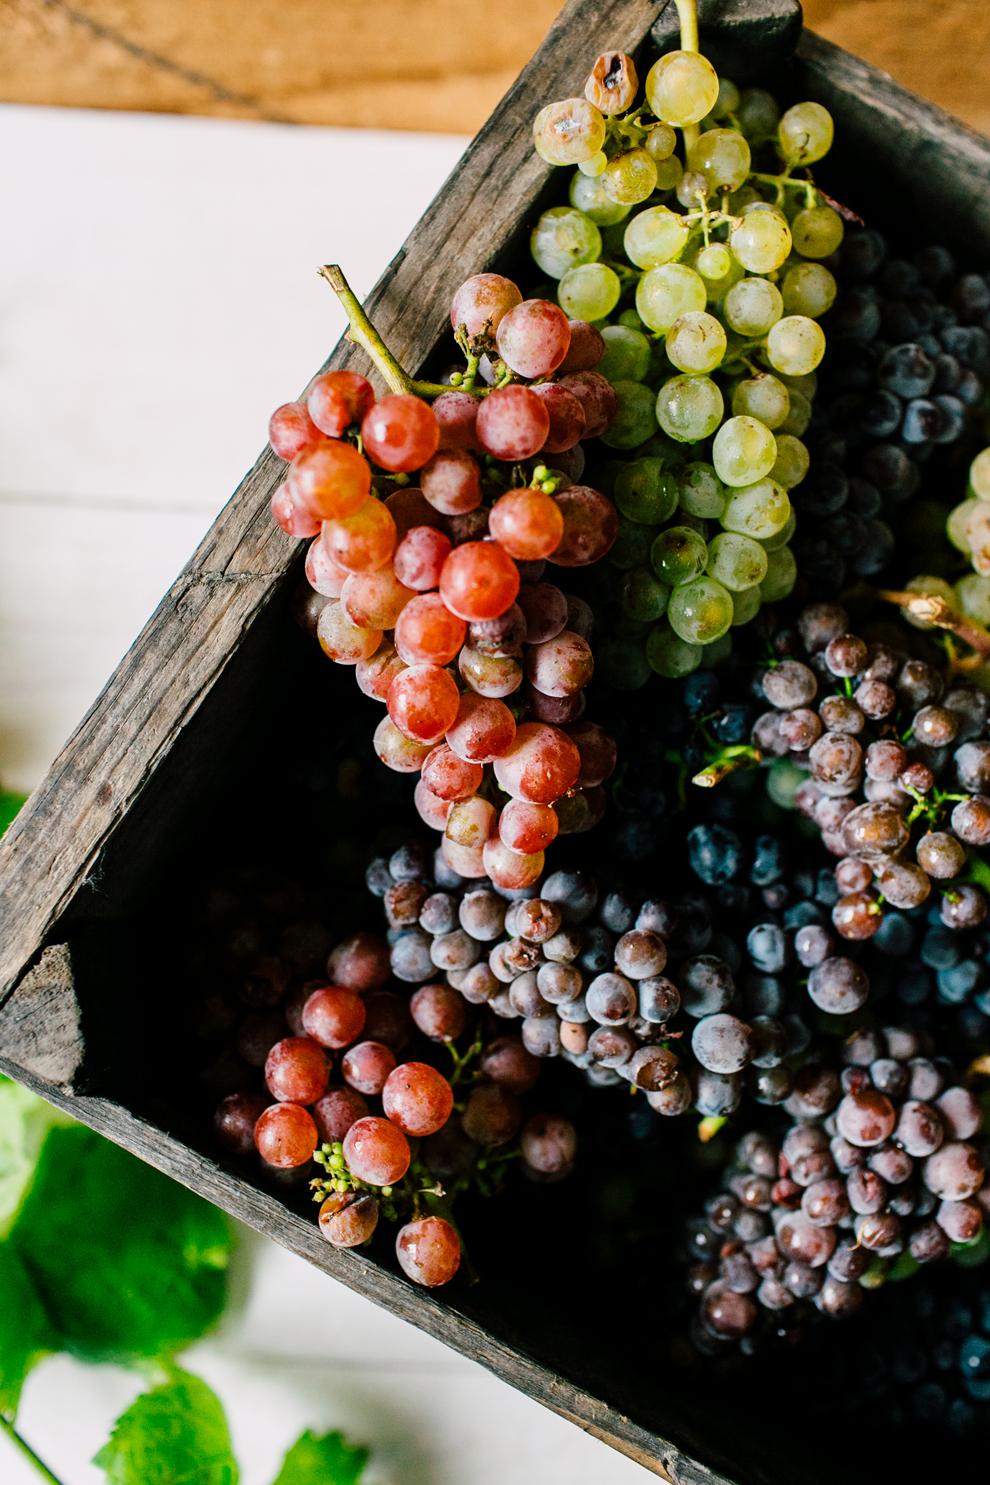 010-mount-baker-vineyards-grapes-food-bellingham-katheryn-moran-photography.jpg